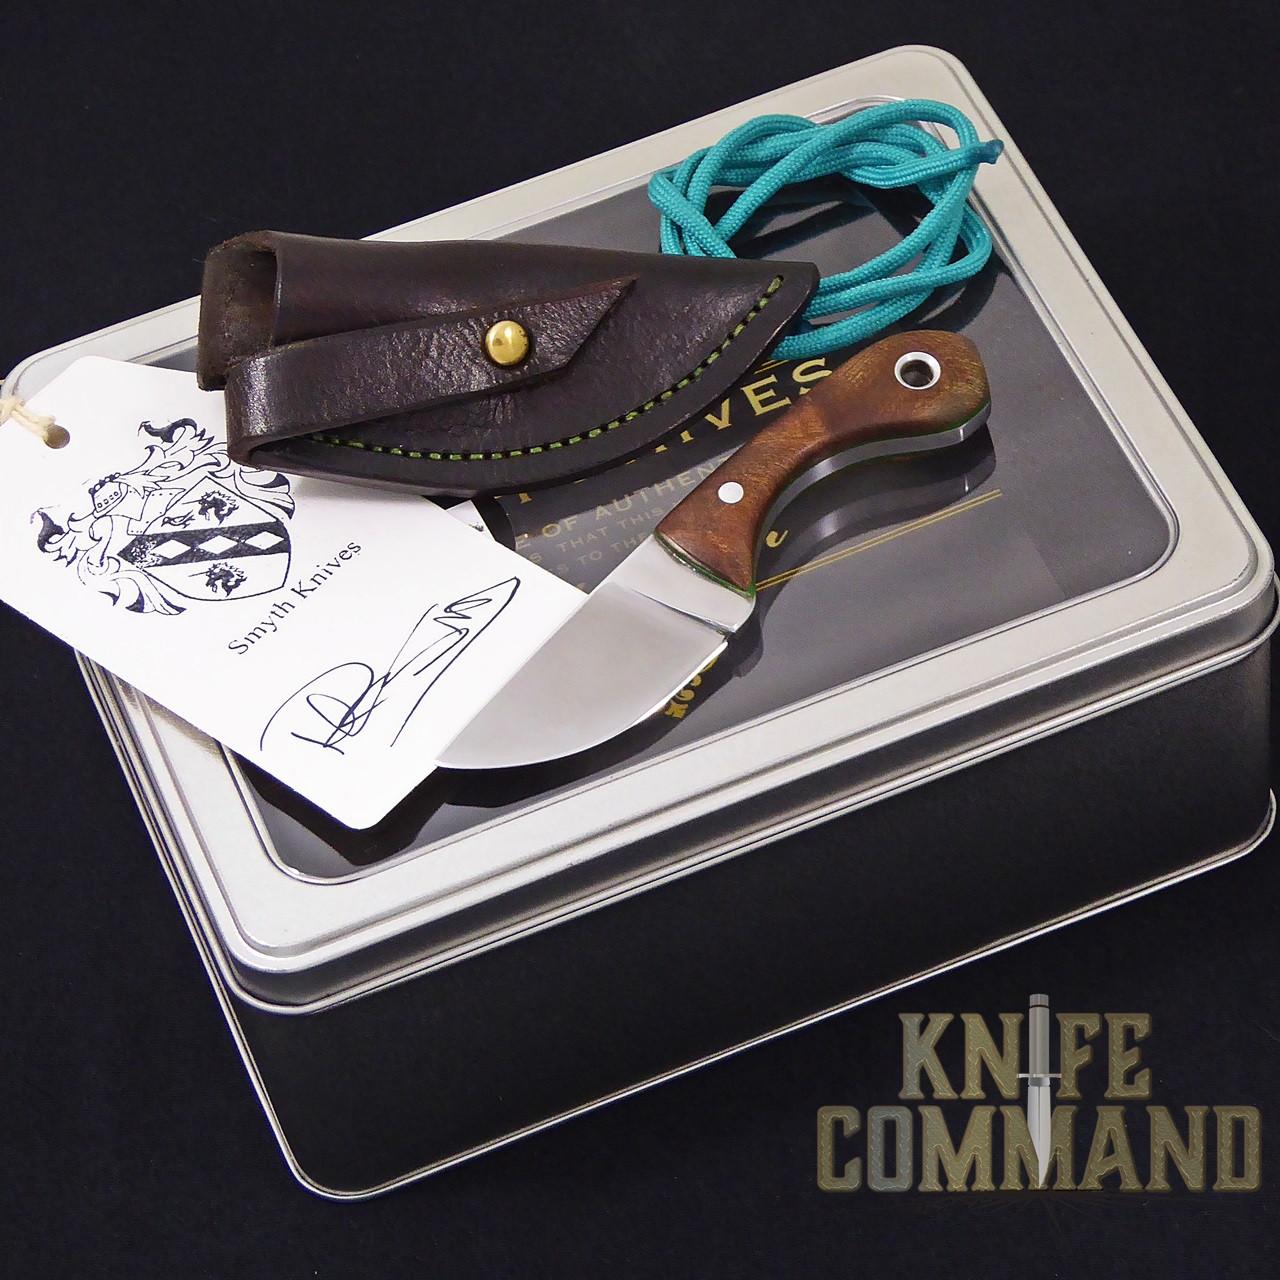 Paddy Smyth Knives Irish Elm Knife, The Leprechaun.  Nice presentation box with certificate of authenticity.